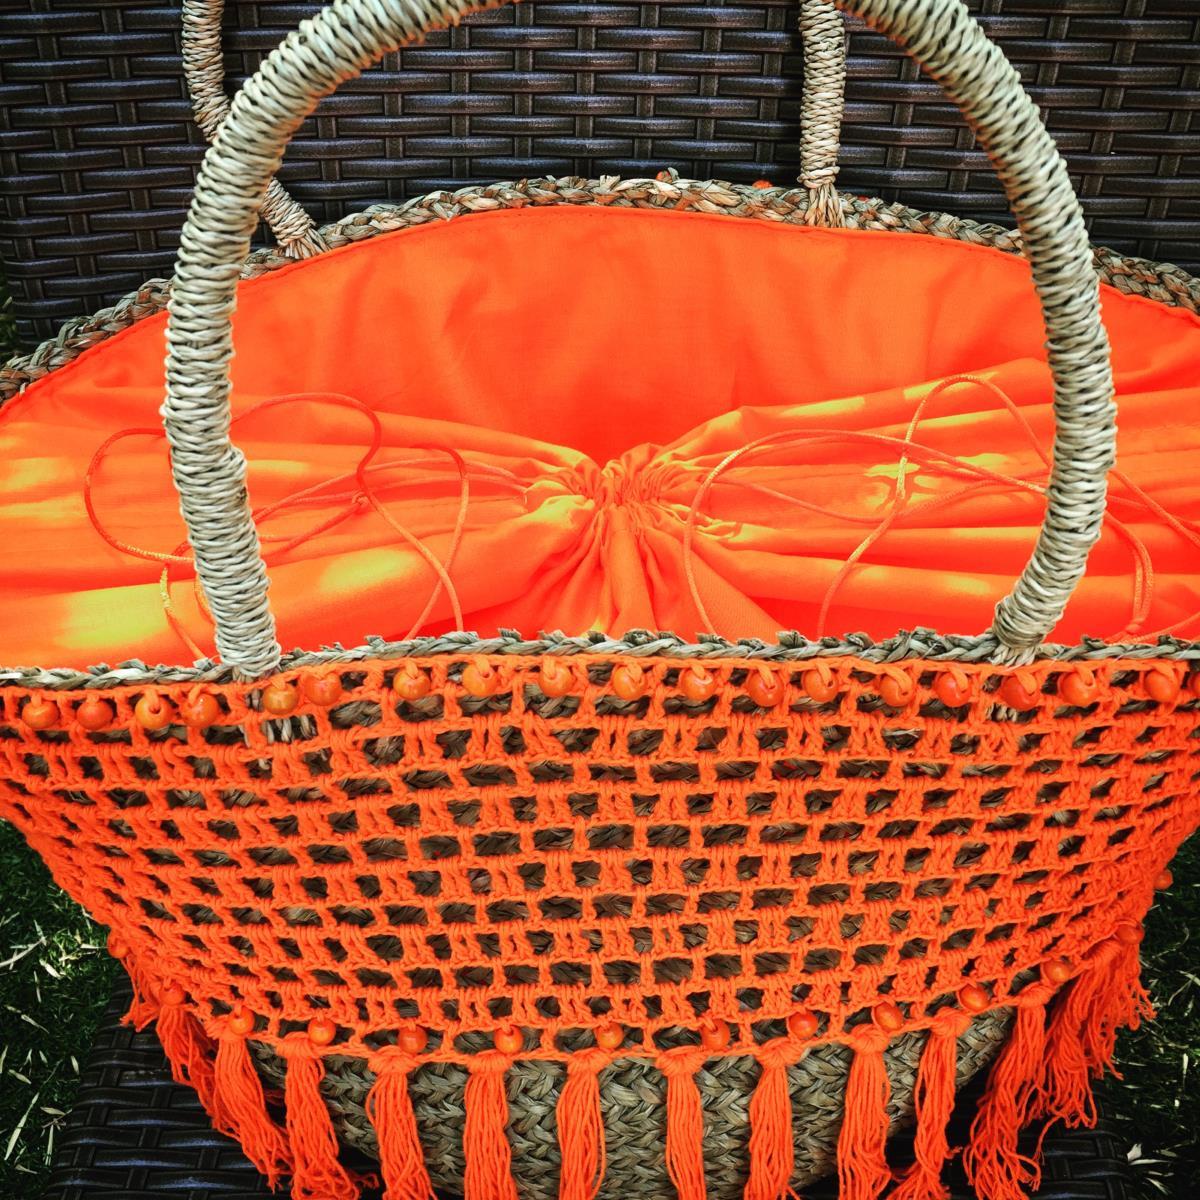 panier de plage ubud orange tendances du monde. Black Bedroom Furniture Sets. Home Design Ideas